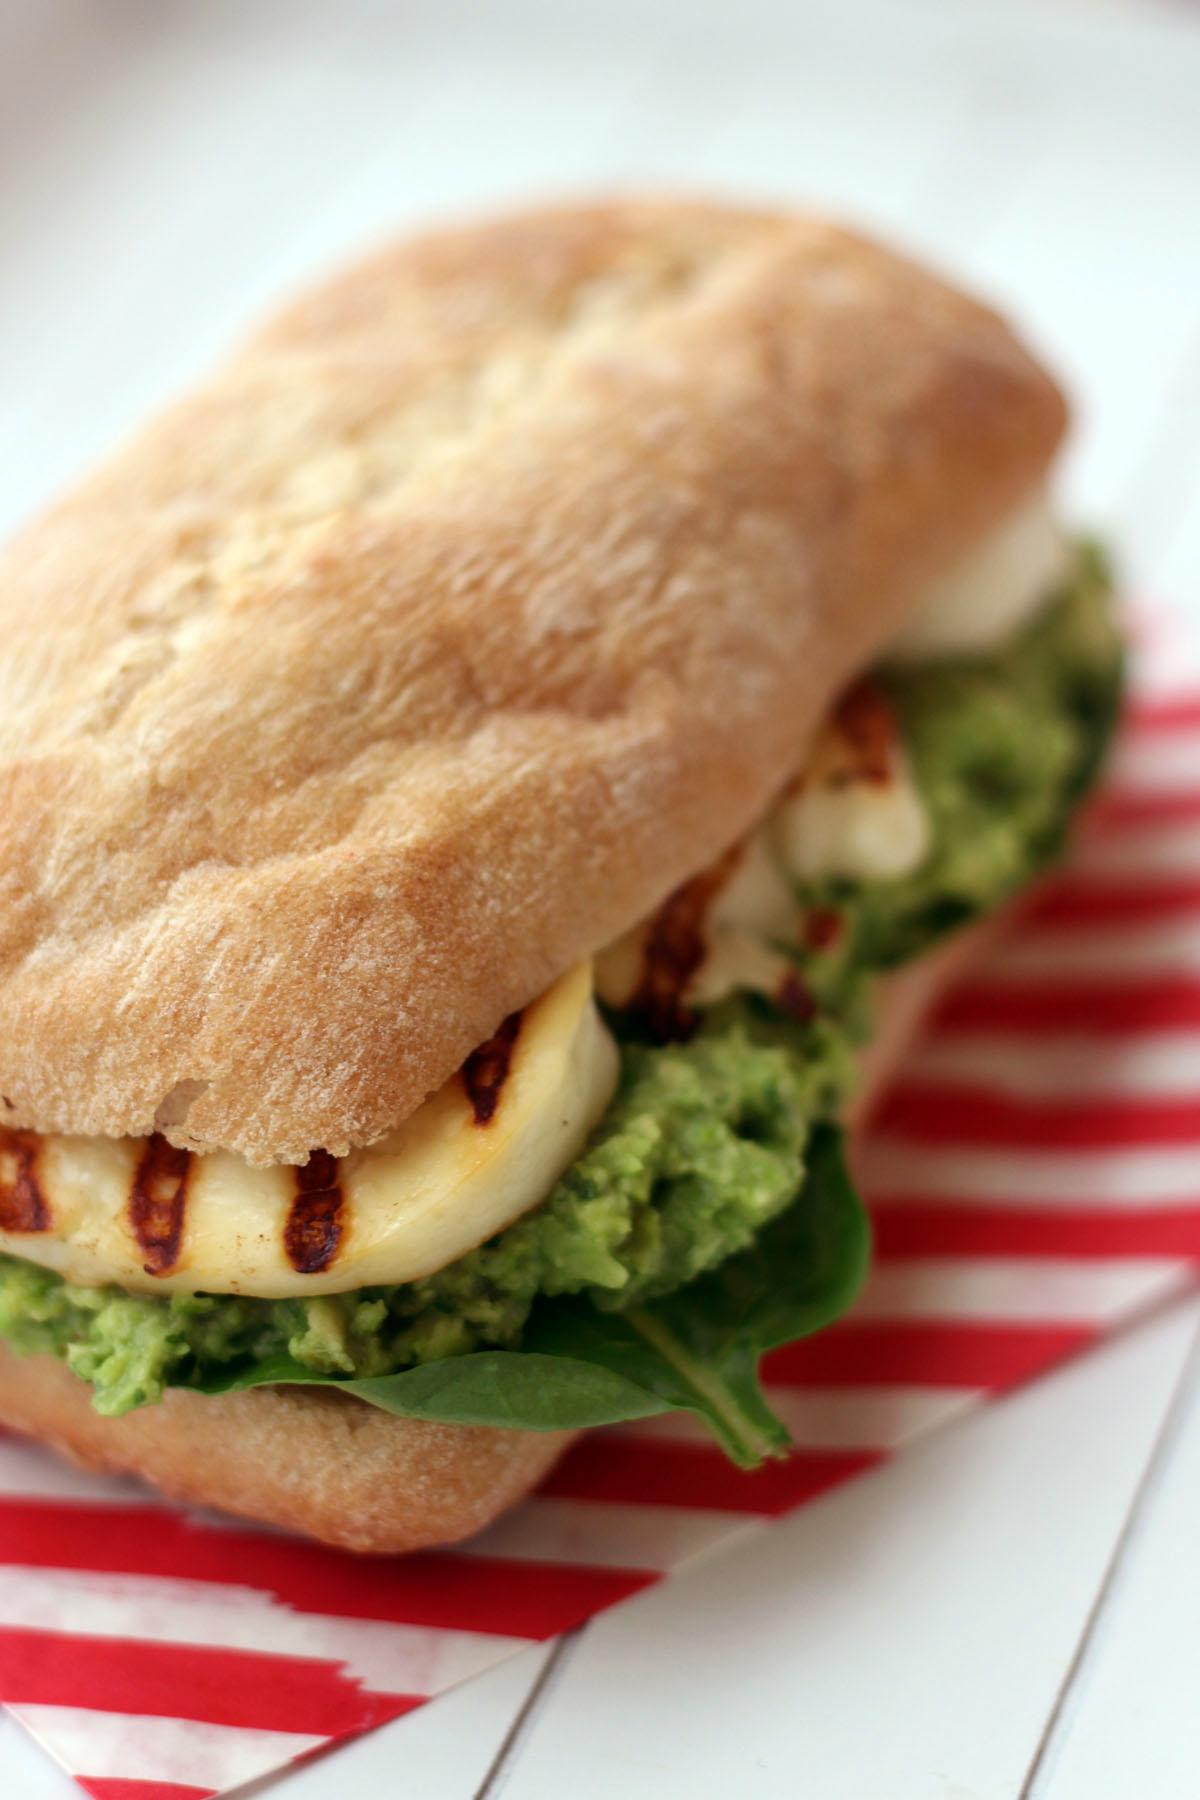 Halloumi Sandwich with Avocado, Pea and Mint Pesto